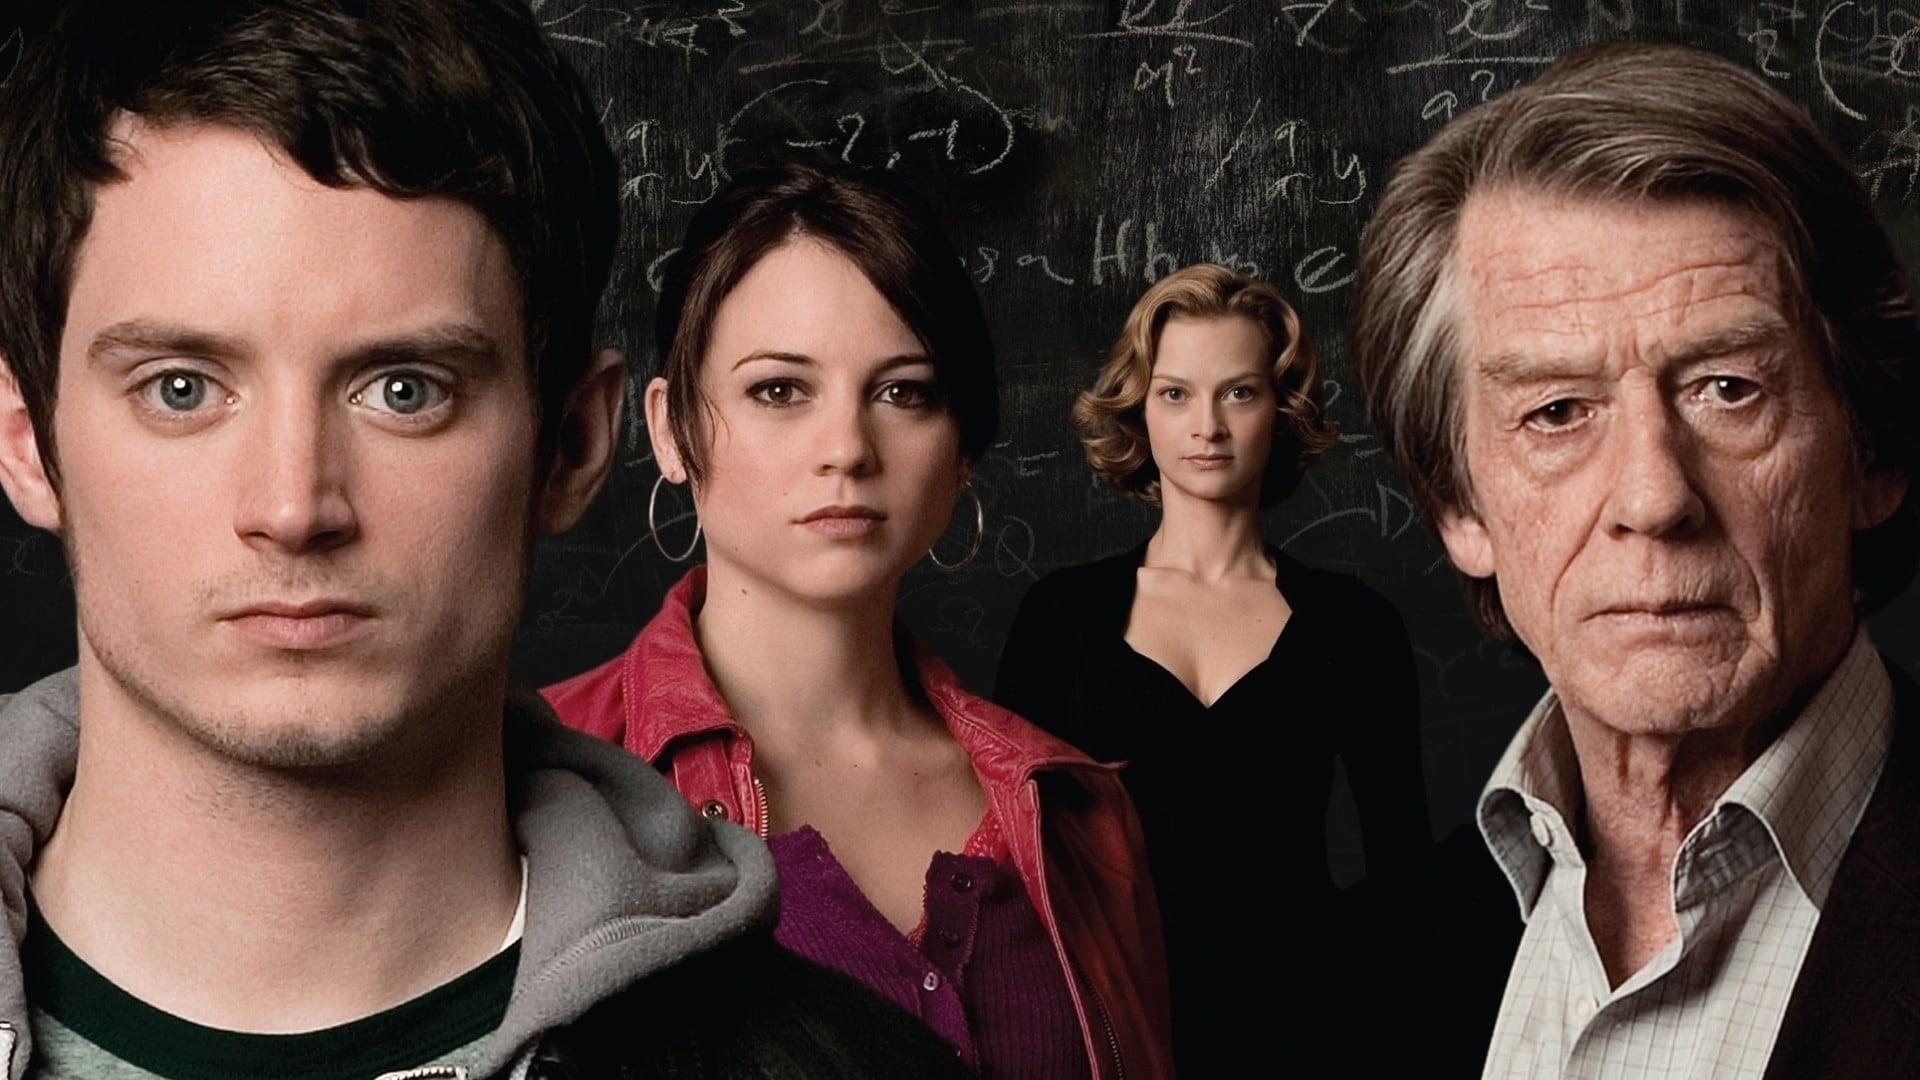 Oxfordin murhat (2008)